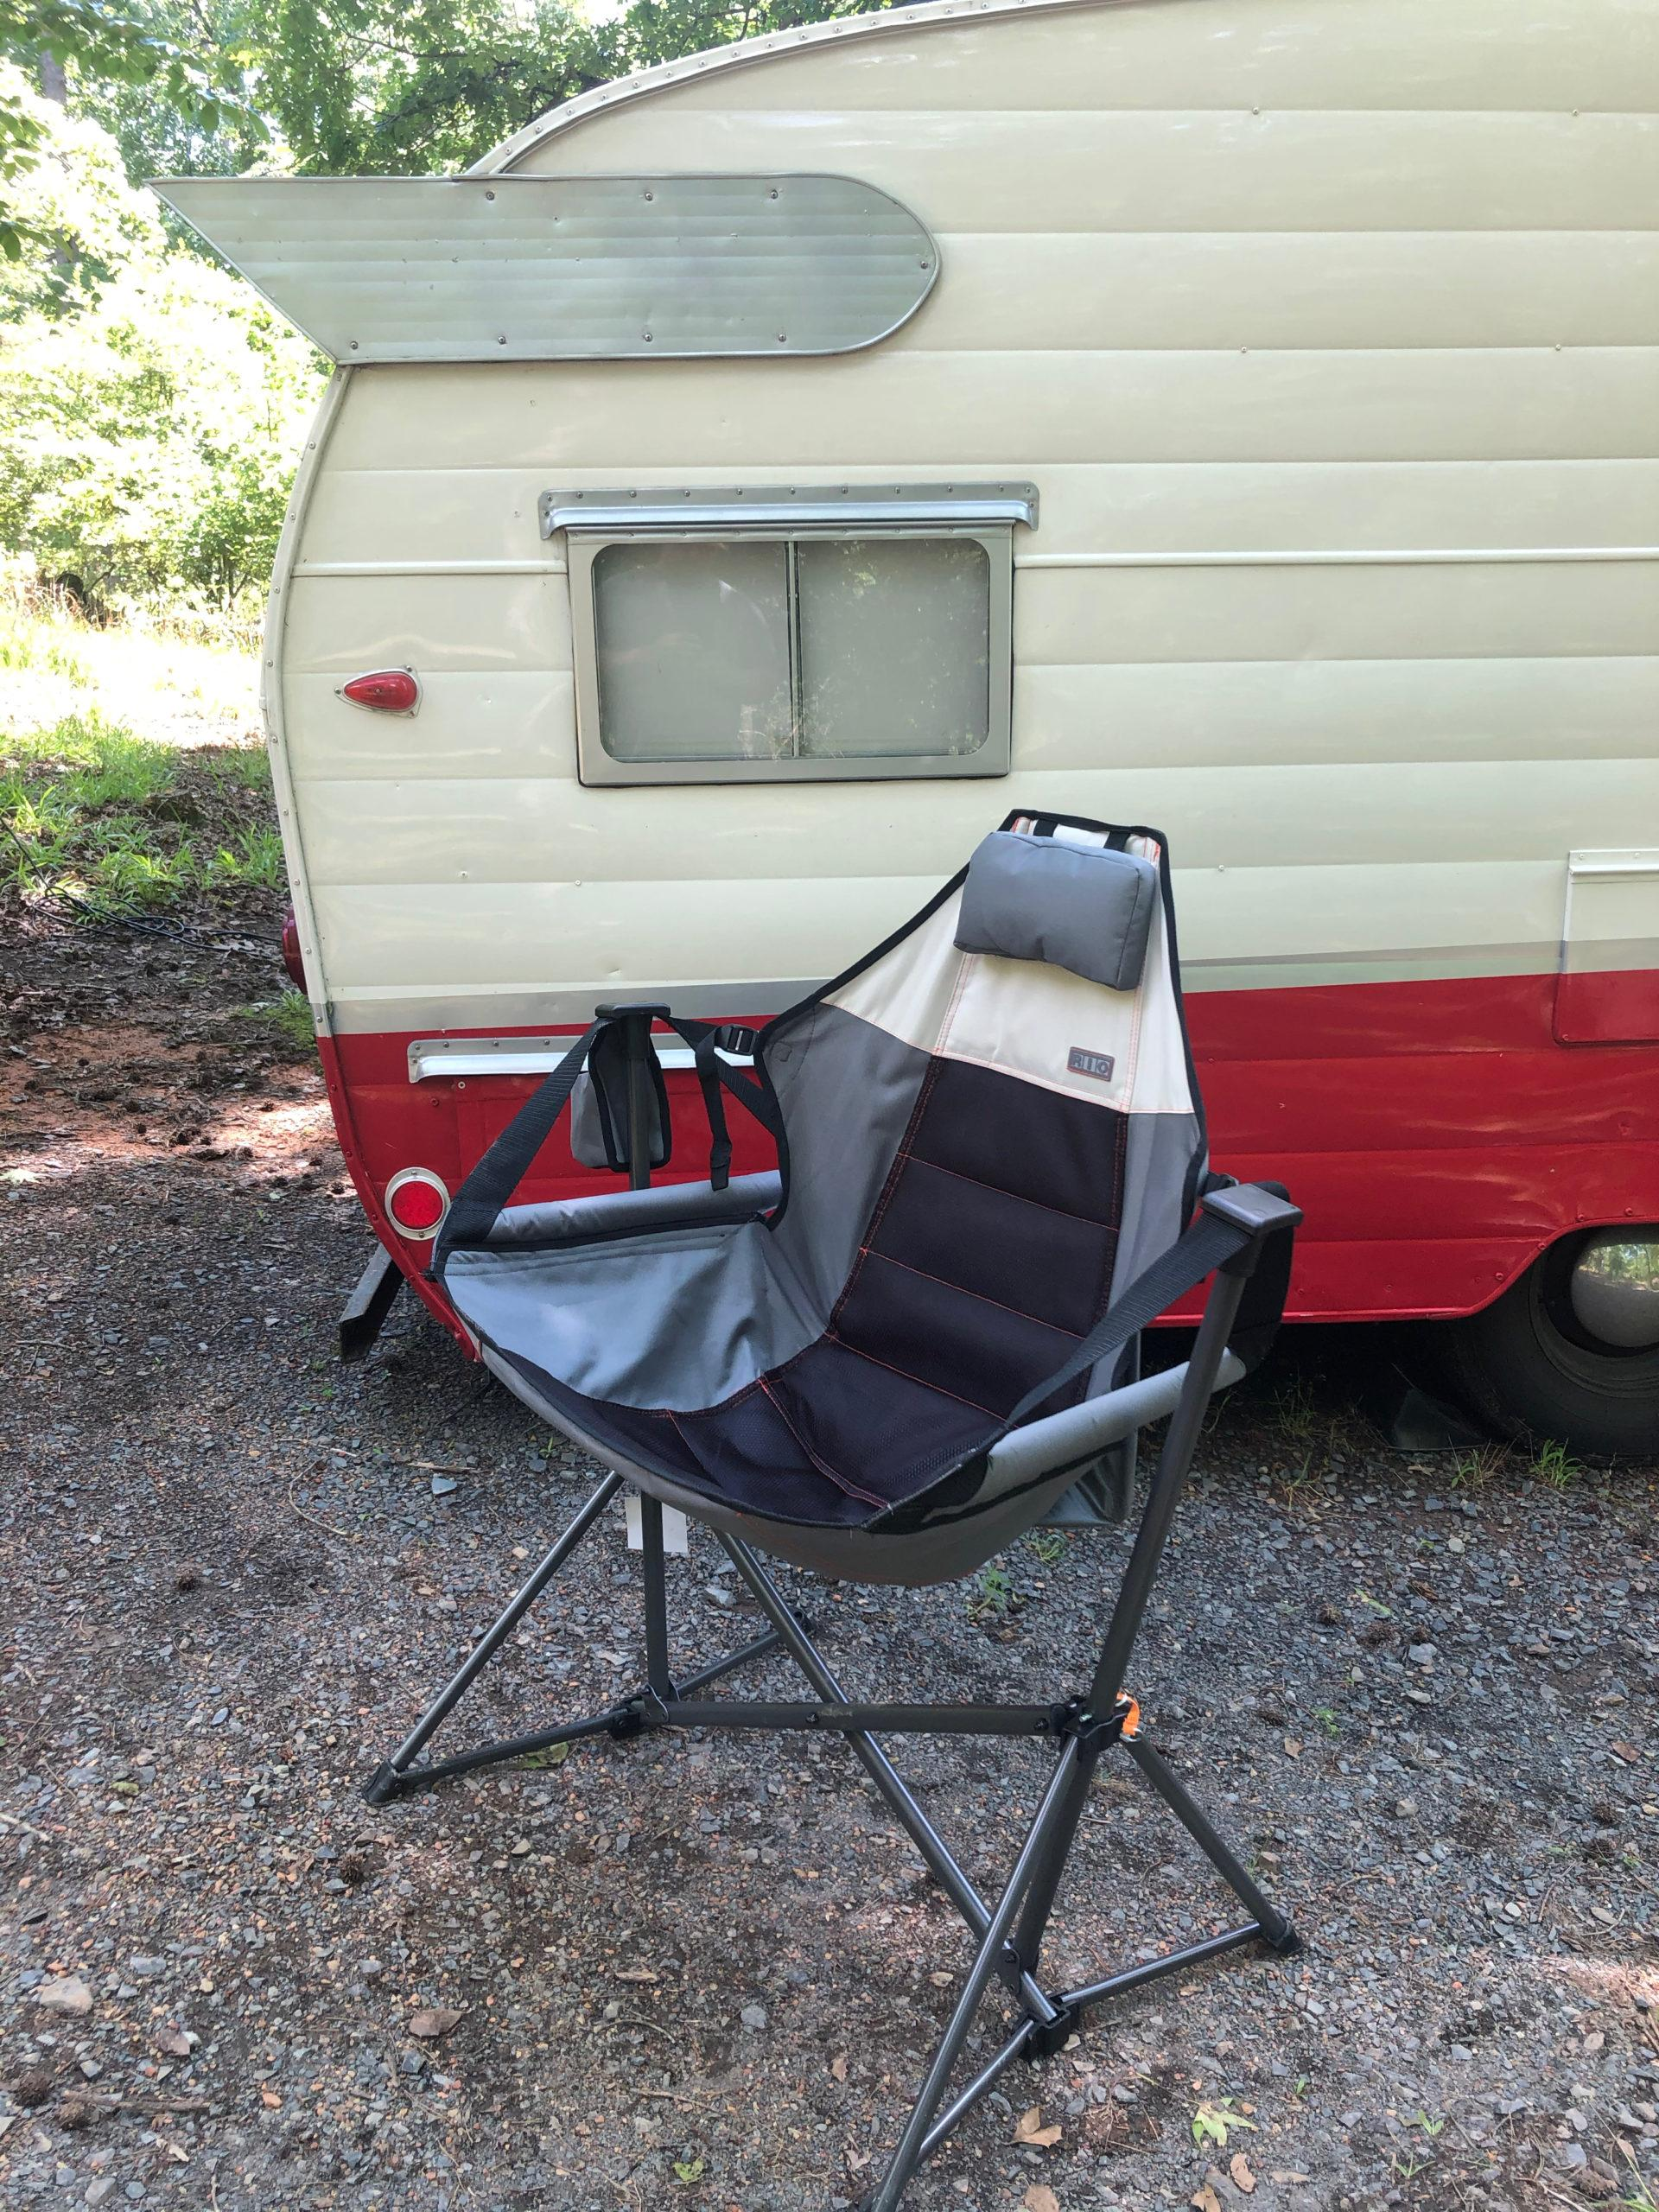 Costco-Rio-Swinging-Hammock-Chair